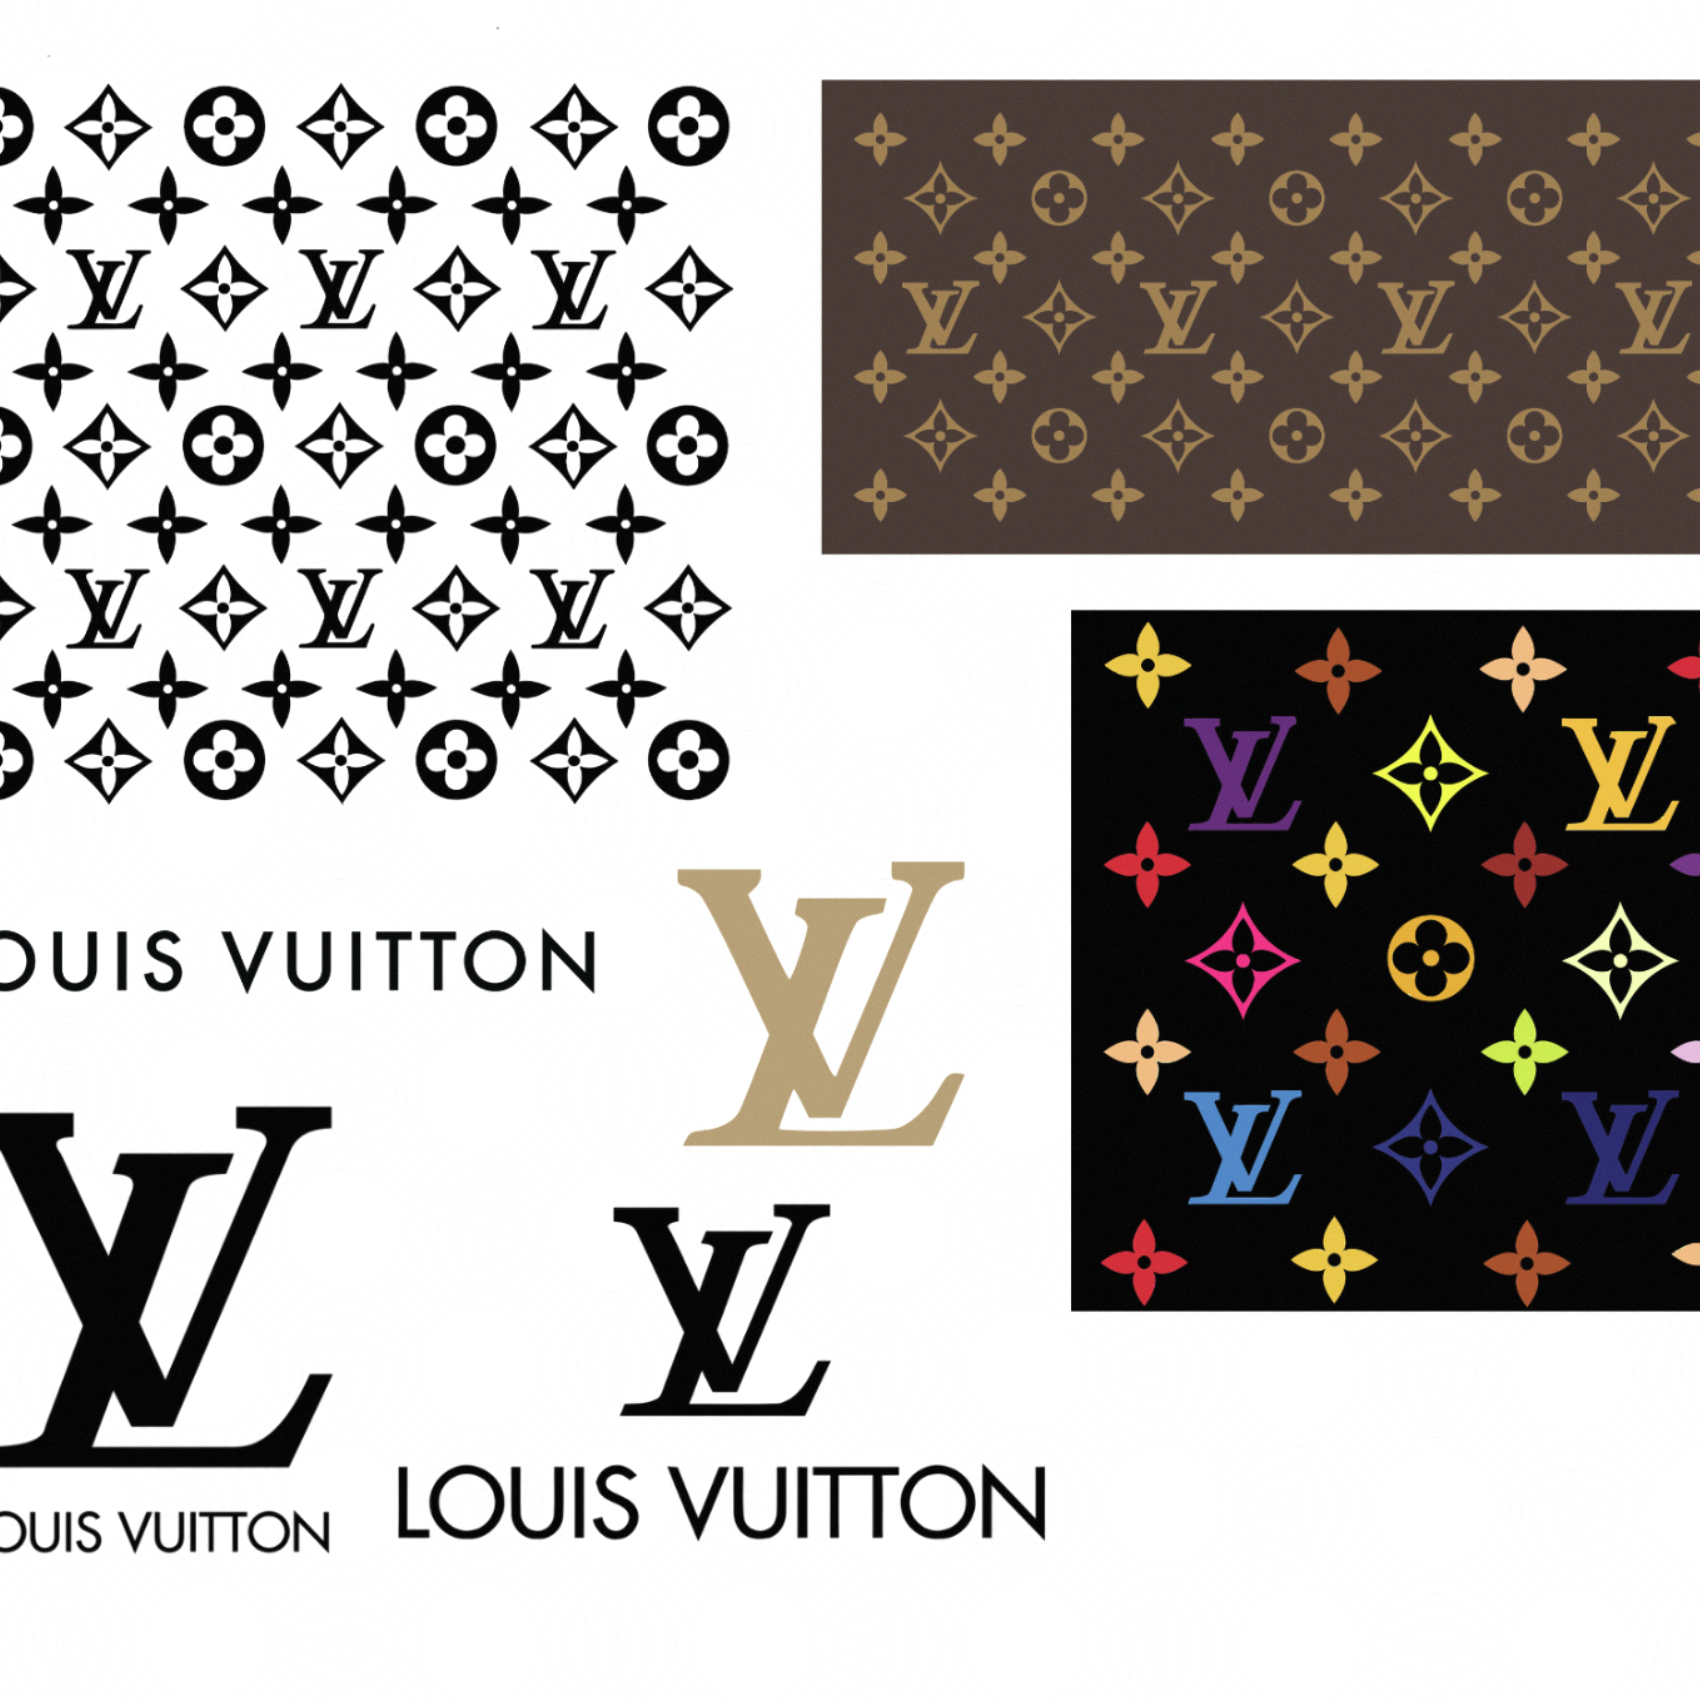 Pin on Louis Vuitton